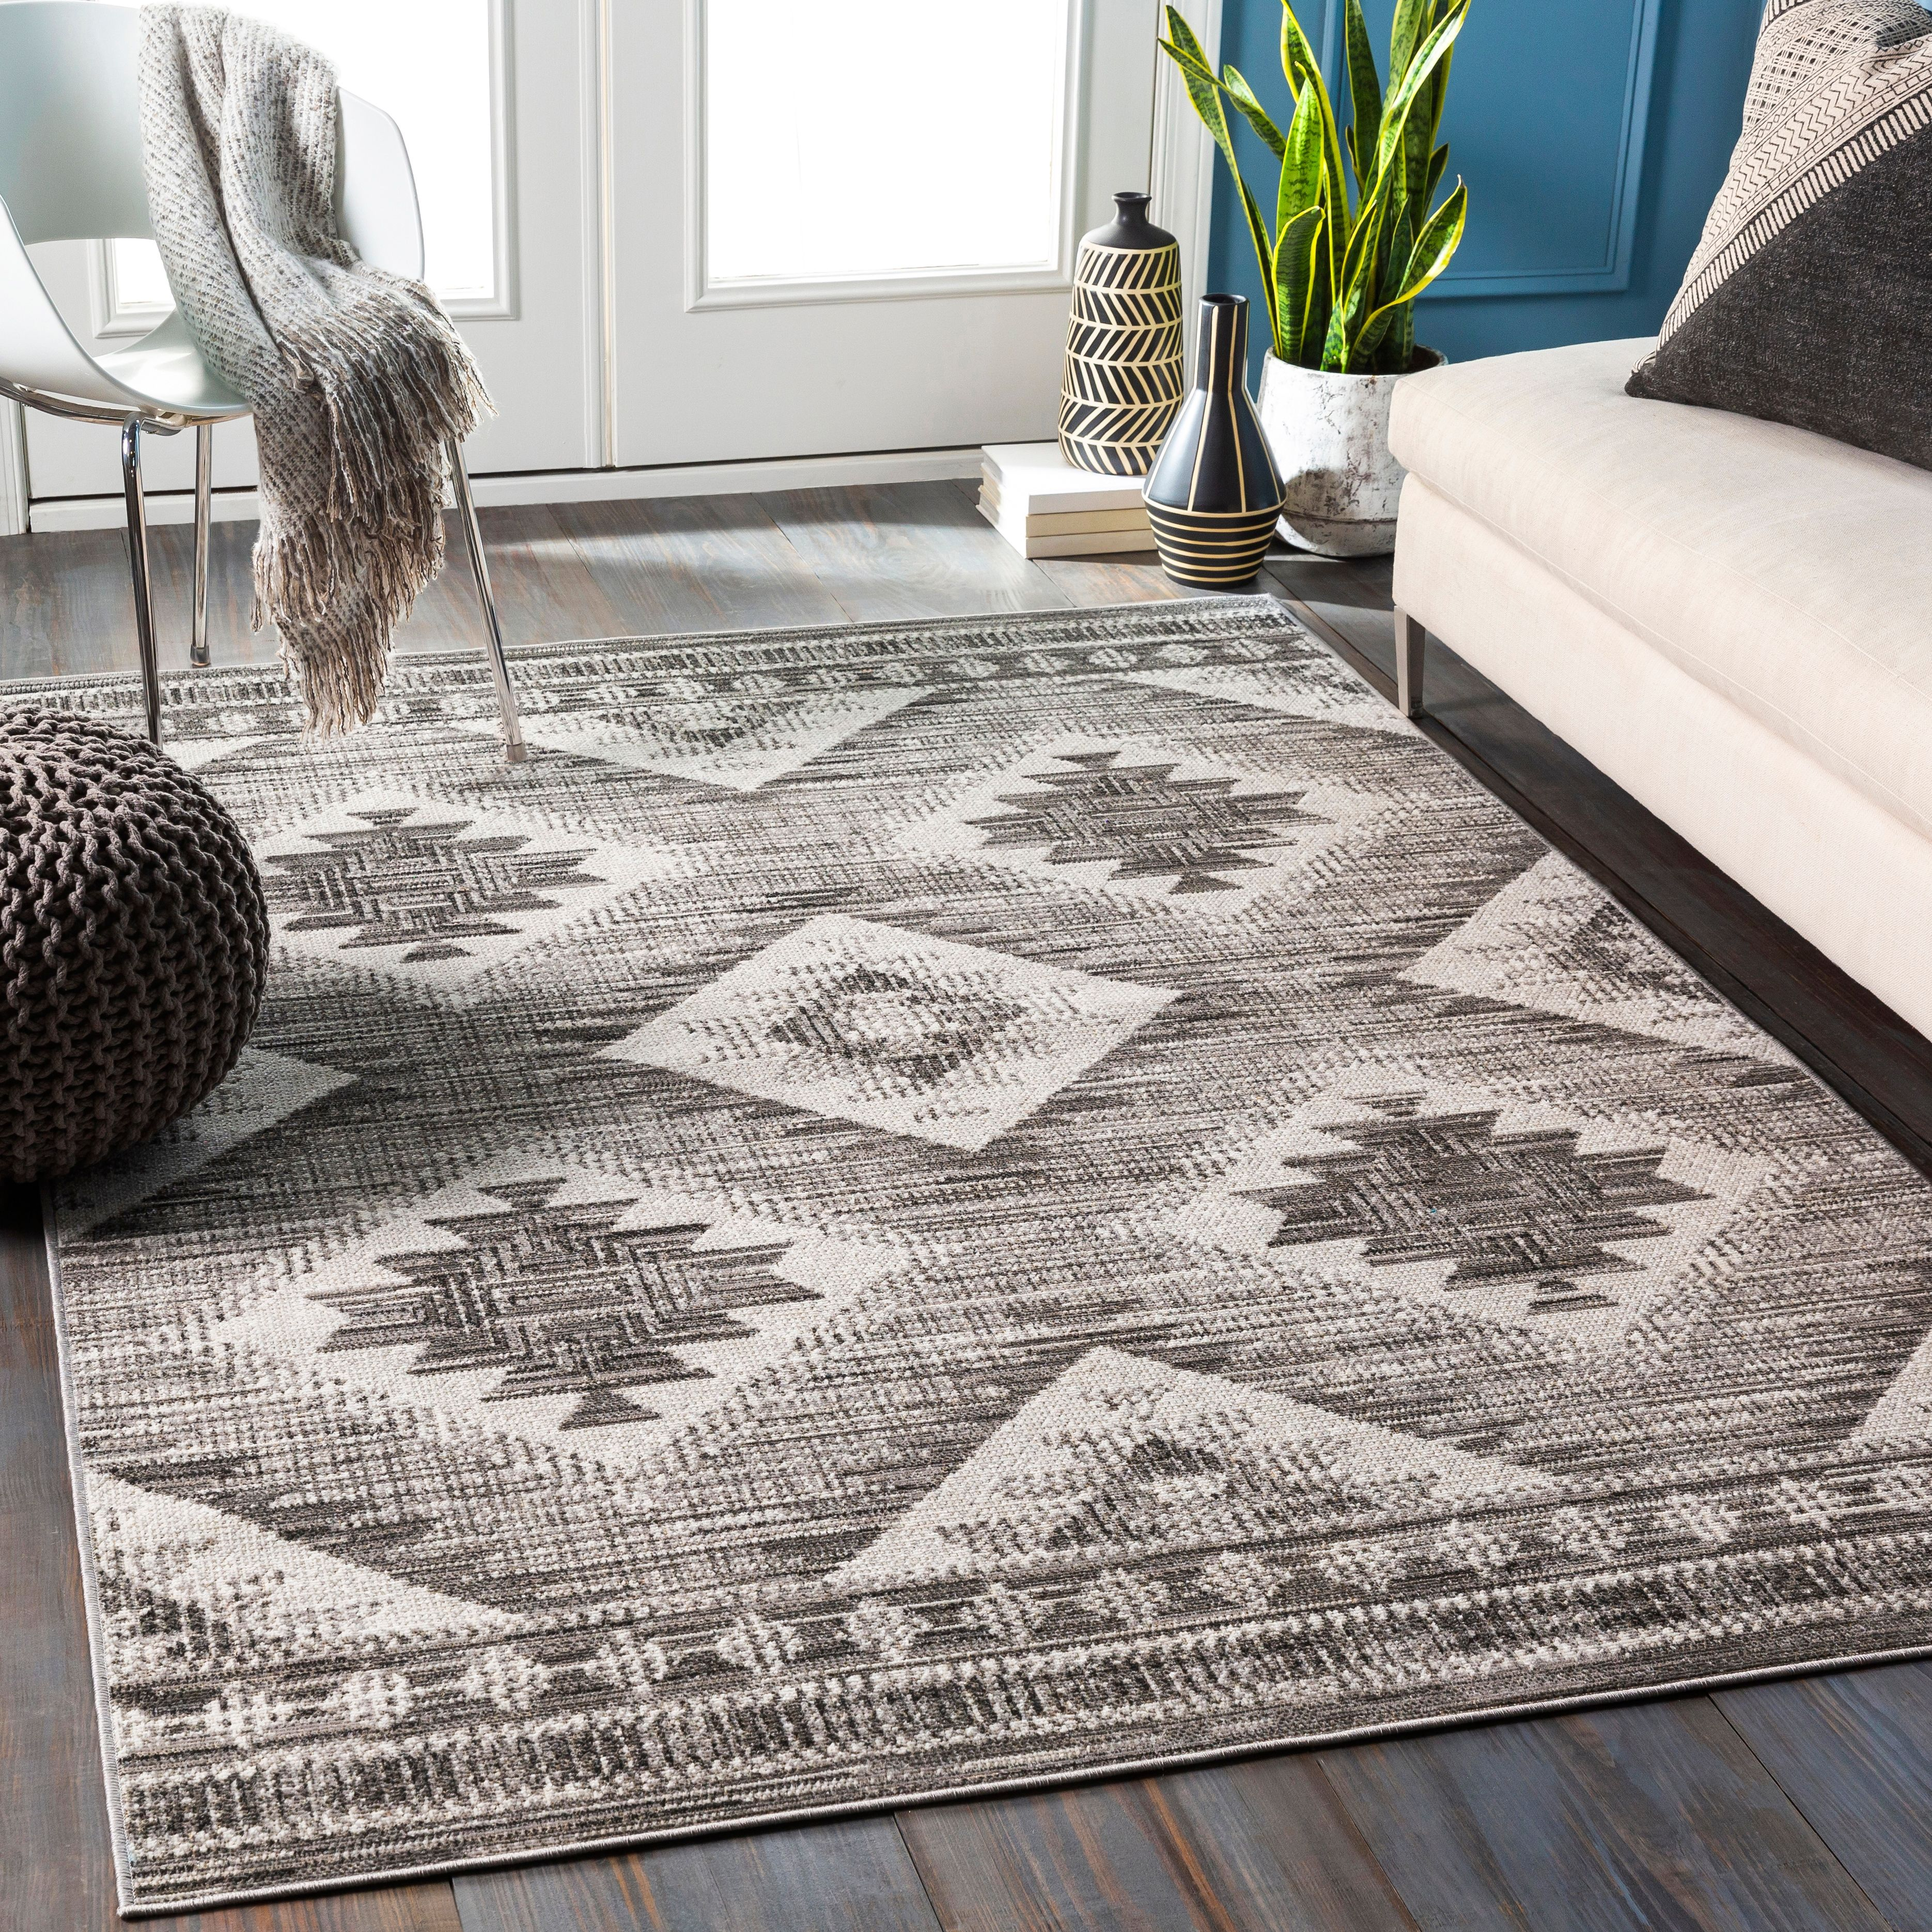 Traditional 5 3 X 7 7 Area Rug Ashley Furniture Homestore Black Area Rugs Geometric Area Rug Area Rugs 5 by 7 area rugs